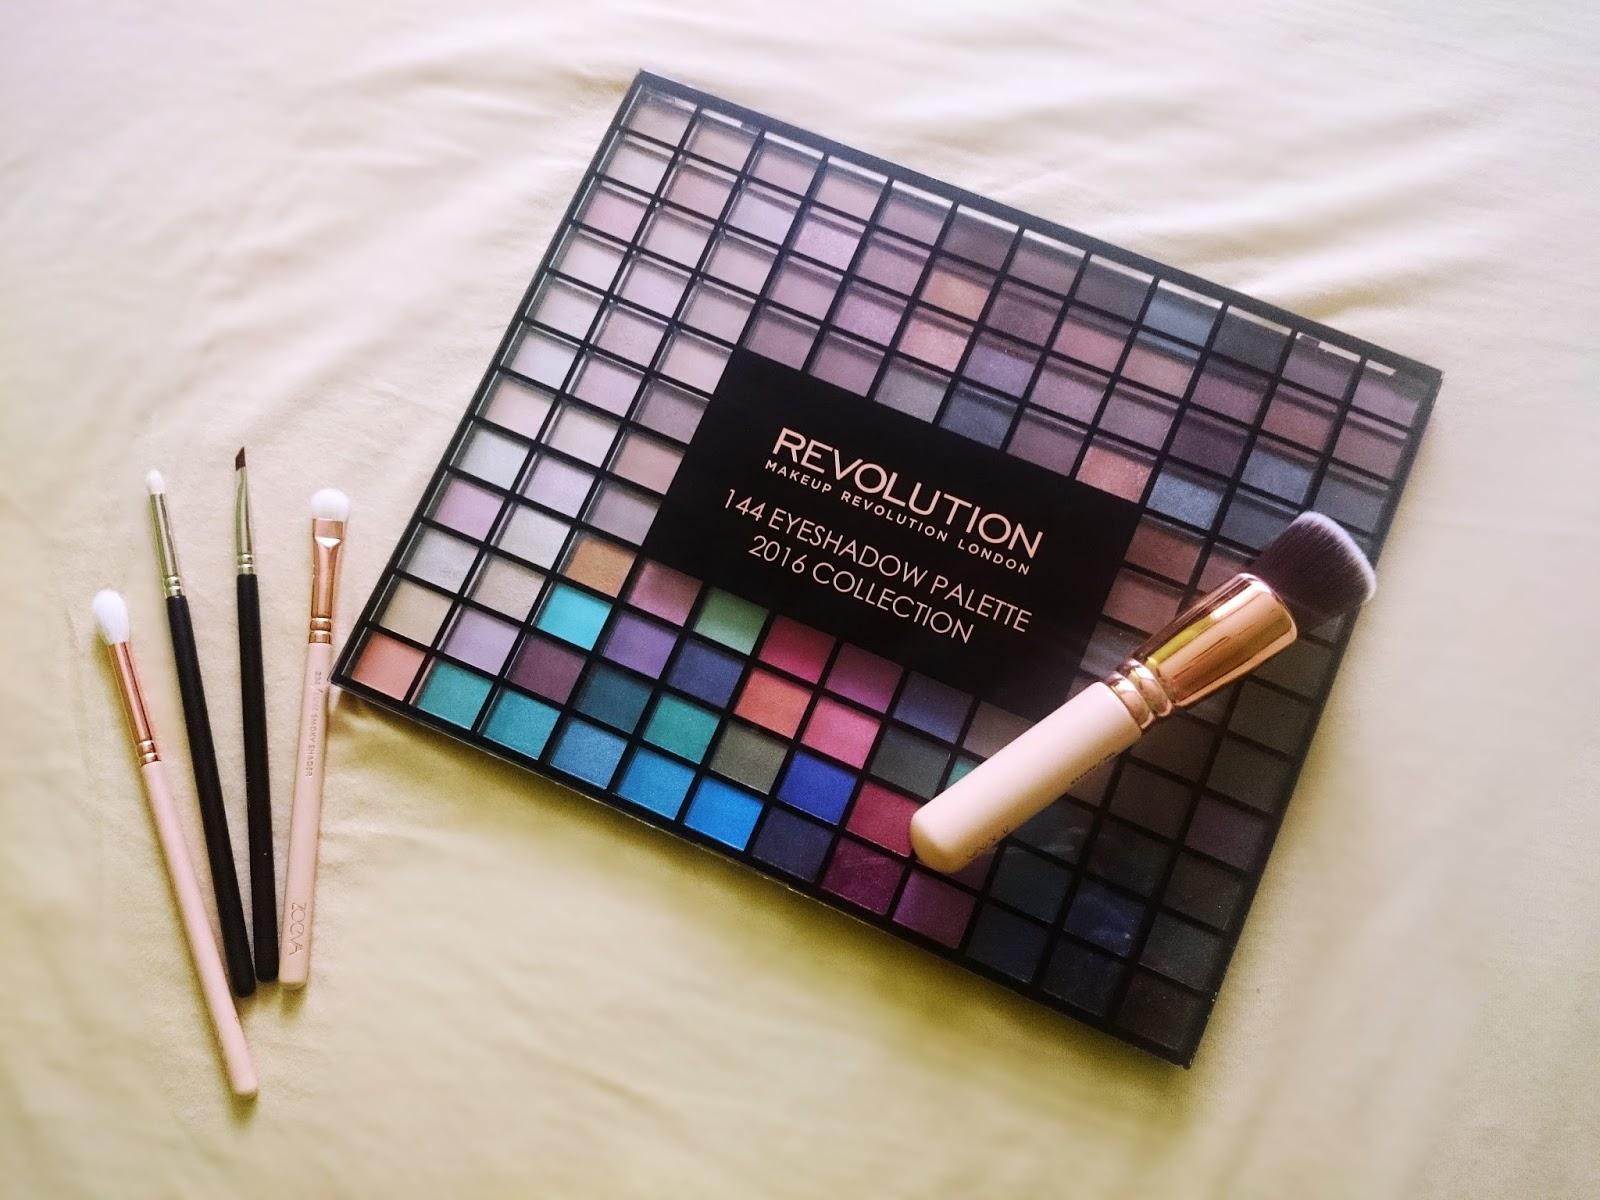 Kolor na pochmurny dzień - 144 Eyeshadow Palette Makeup Revolution